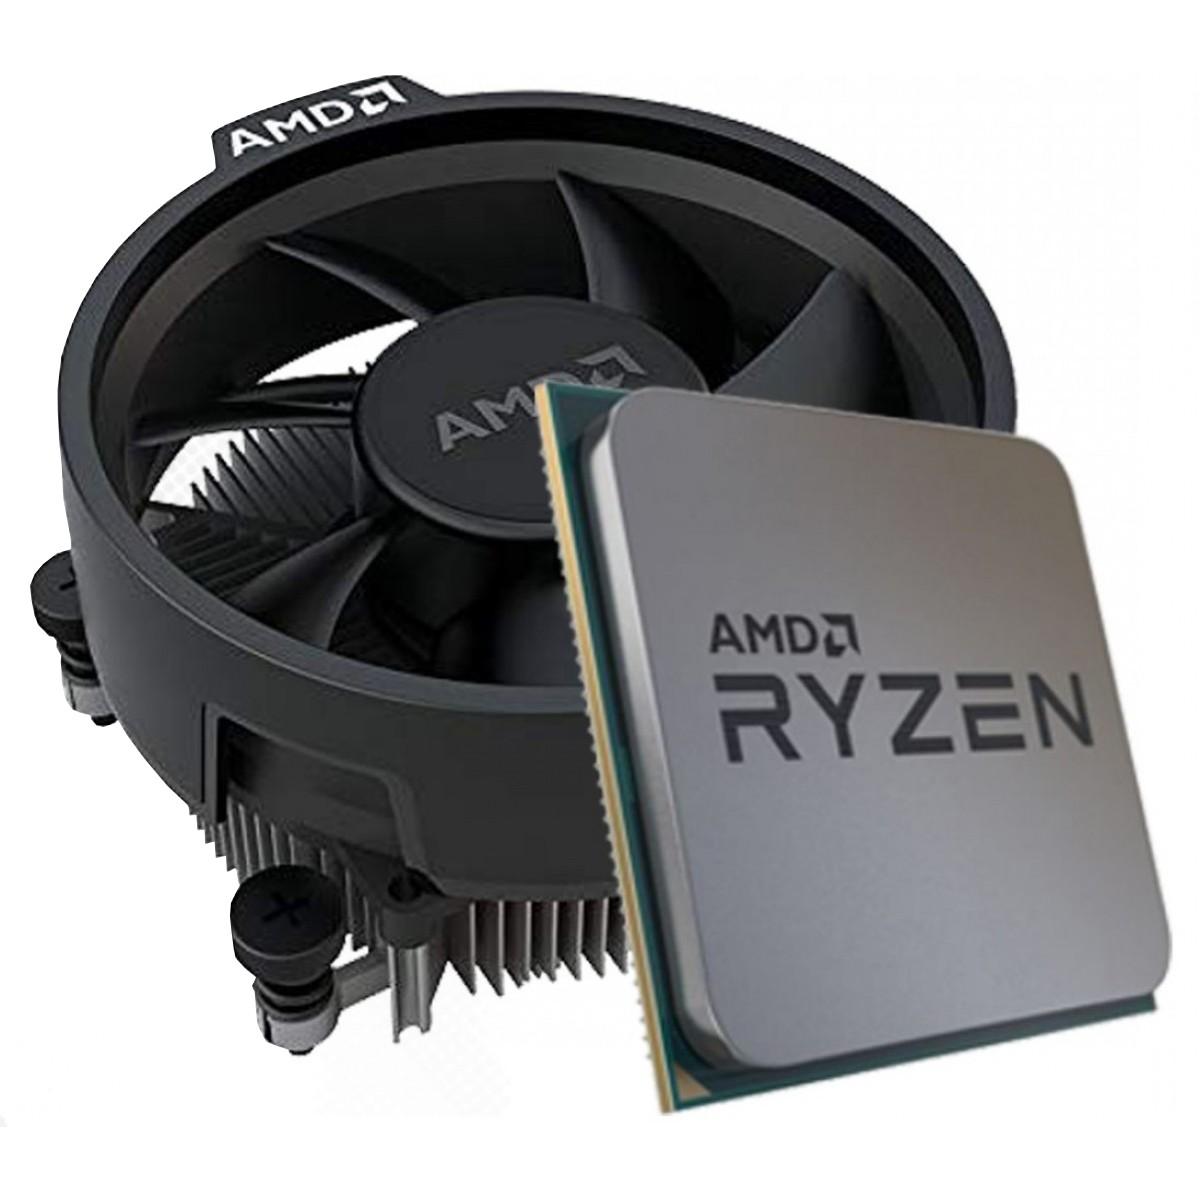 Kit Upgrade Biostar Radeon RX 550 2GB + AMD Ryzen 5 3500 + Memória DDR4 16GB (2x8GB) 3000Mhz